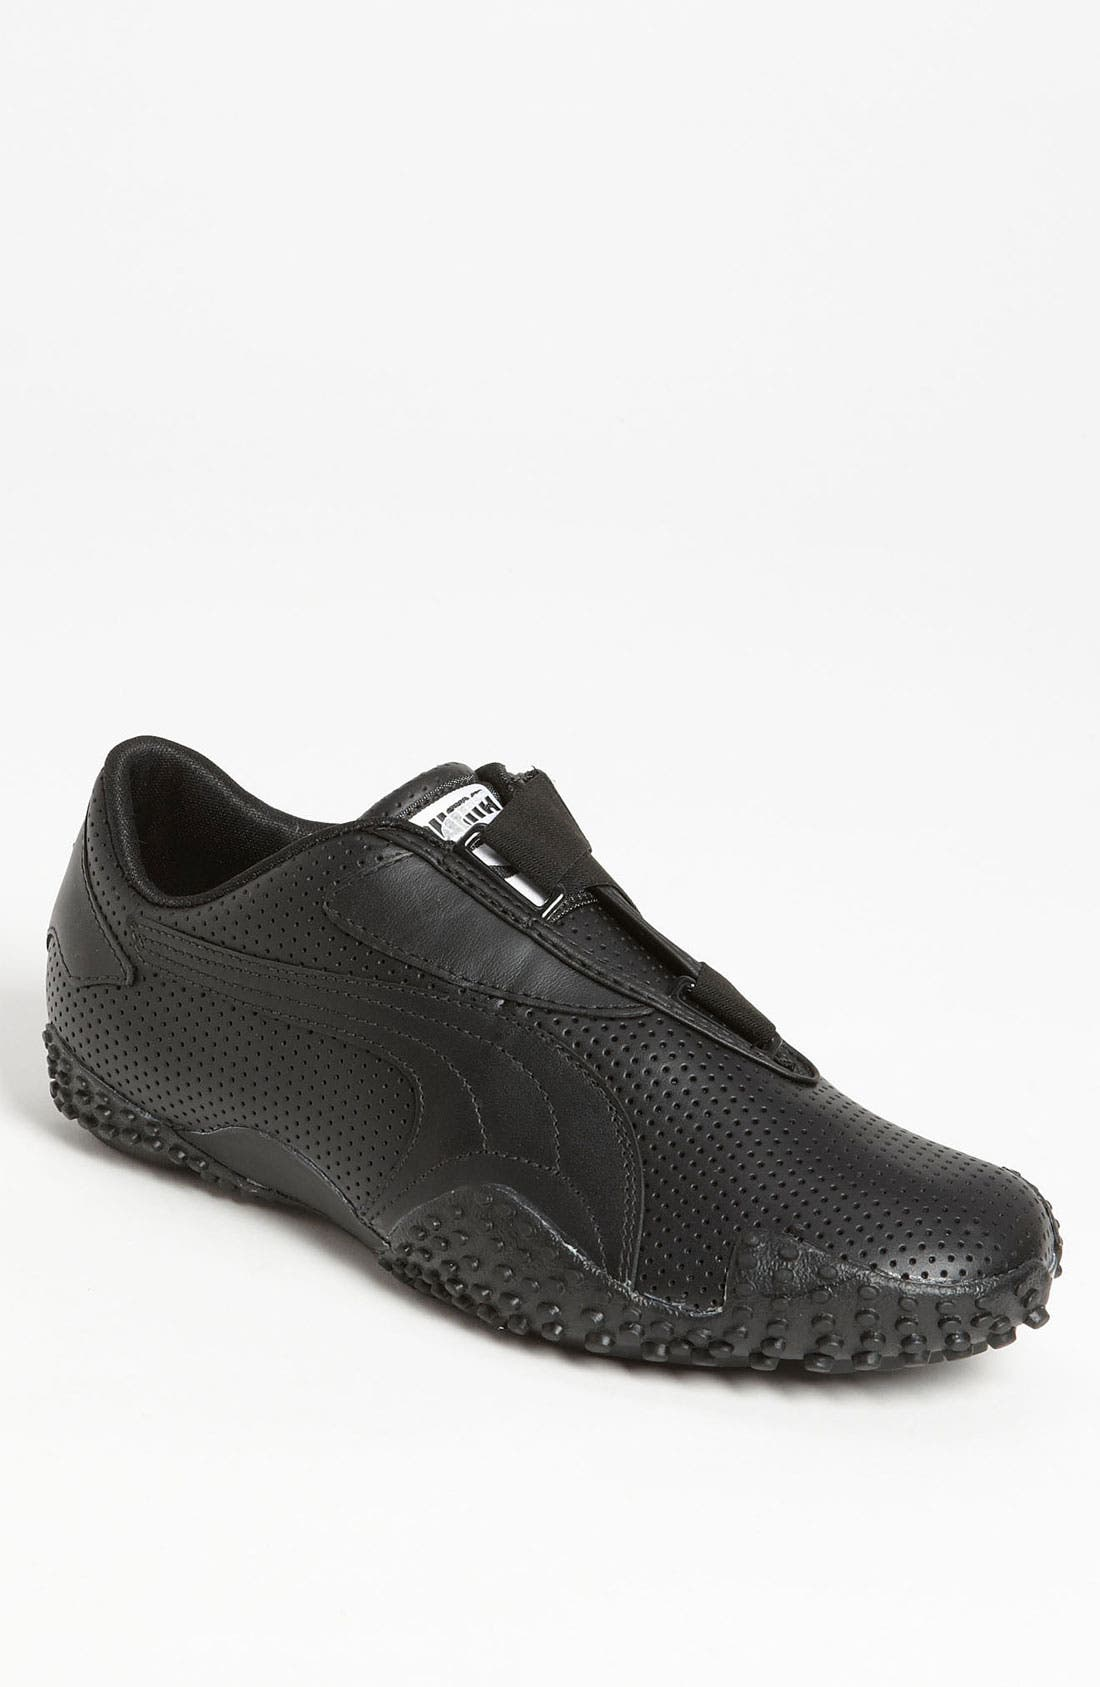 Alternate Image 1 Selected - PUMA 'Mostro' Sneaker (Men)